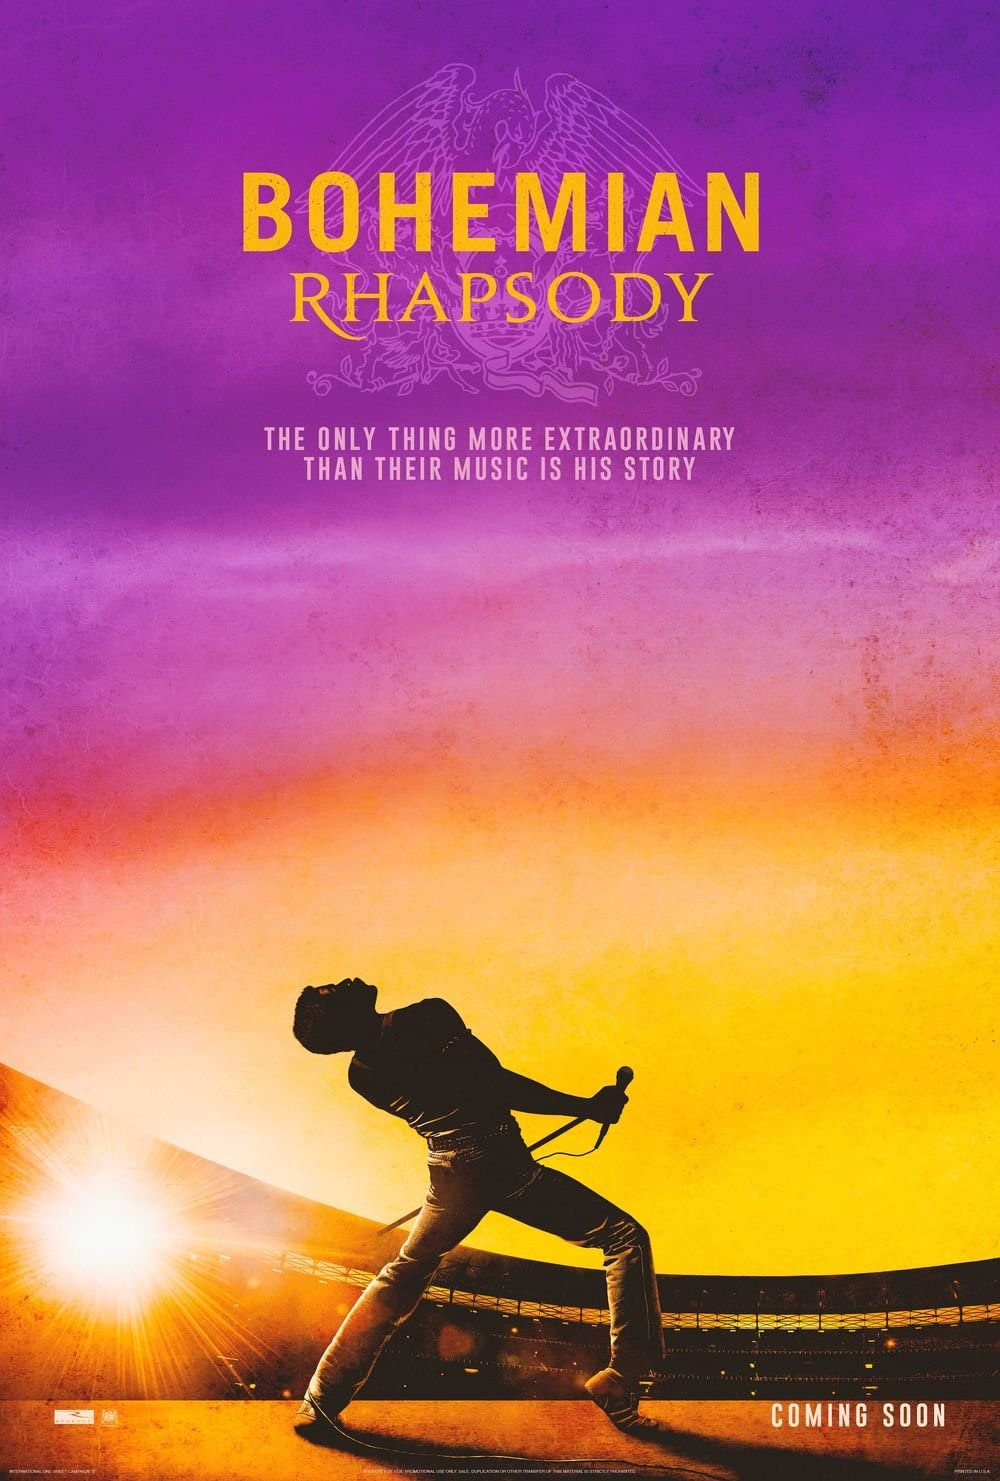 Bohemian-Rhapsody-Cinema-Elios-Carmagnola-Cinema-Sotto-Le-Stelle-Cinema-Estivo